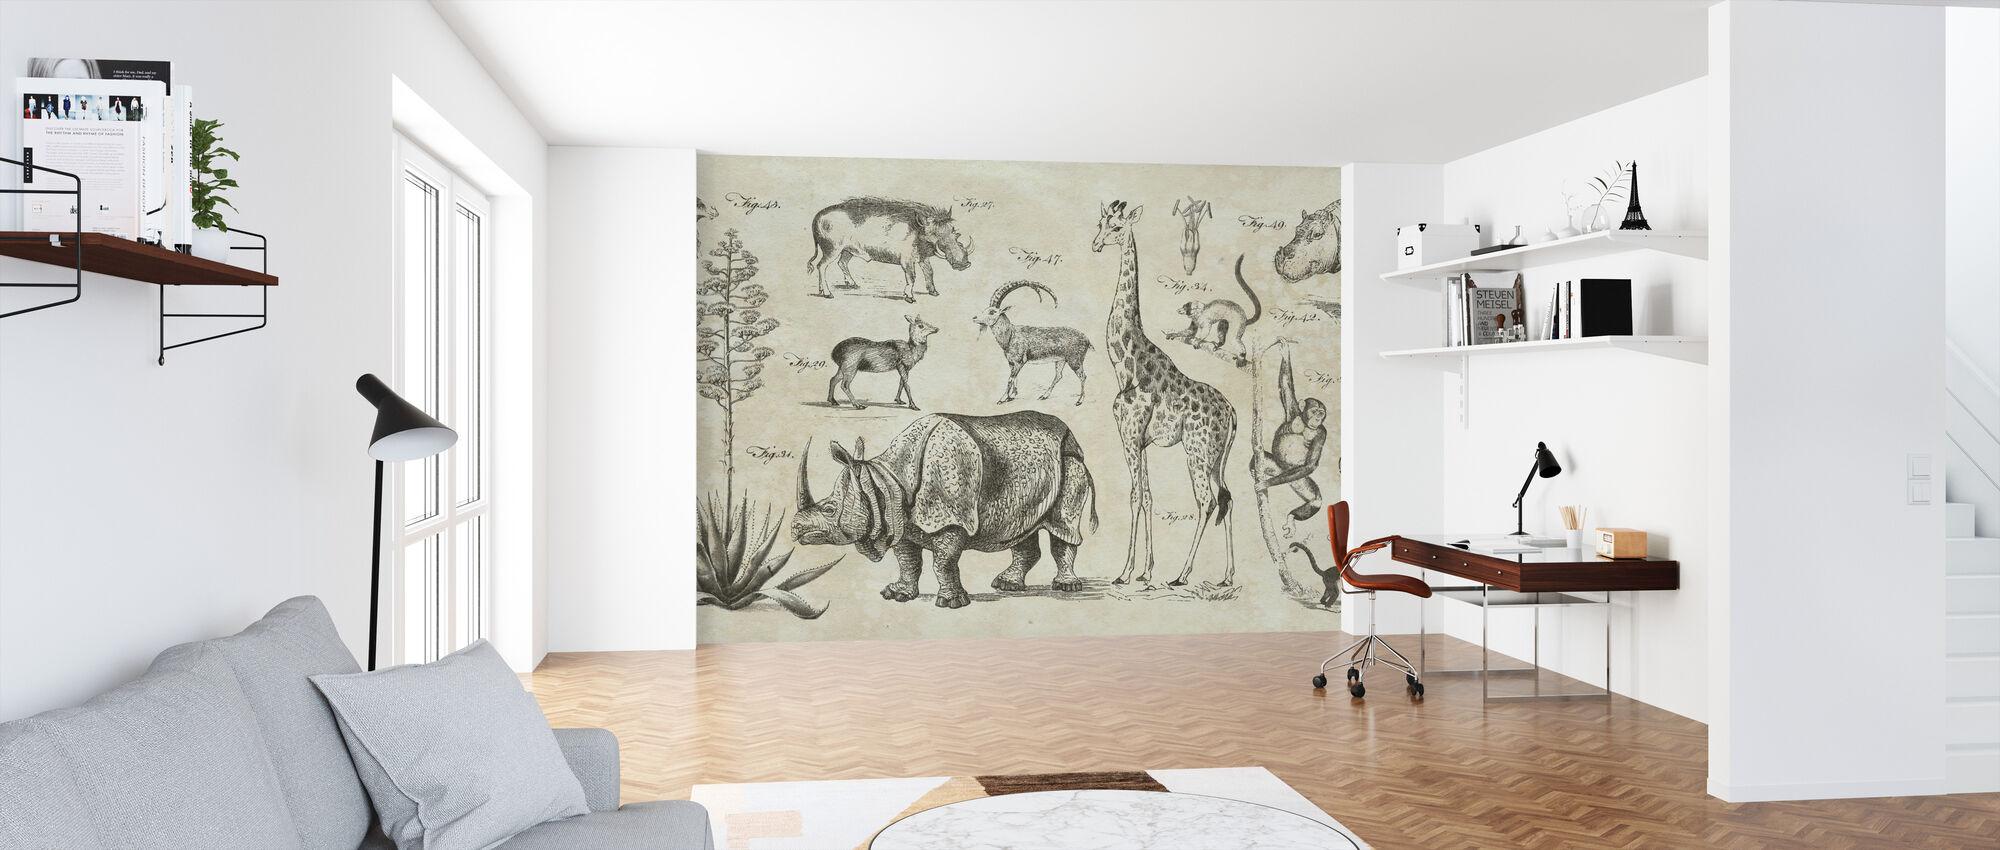 Wild Africa - Wallpaper - Office